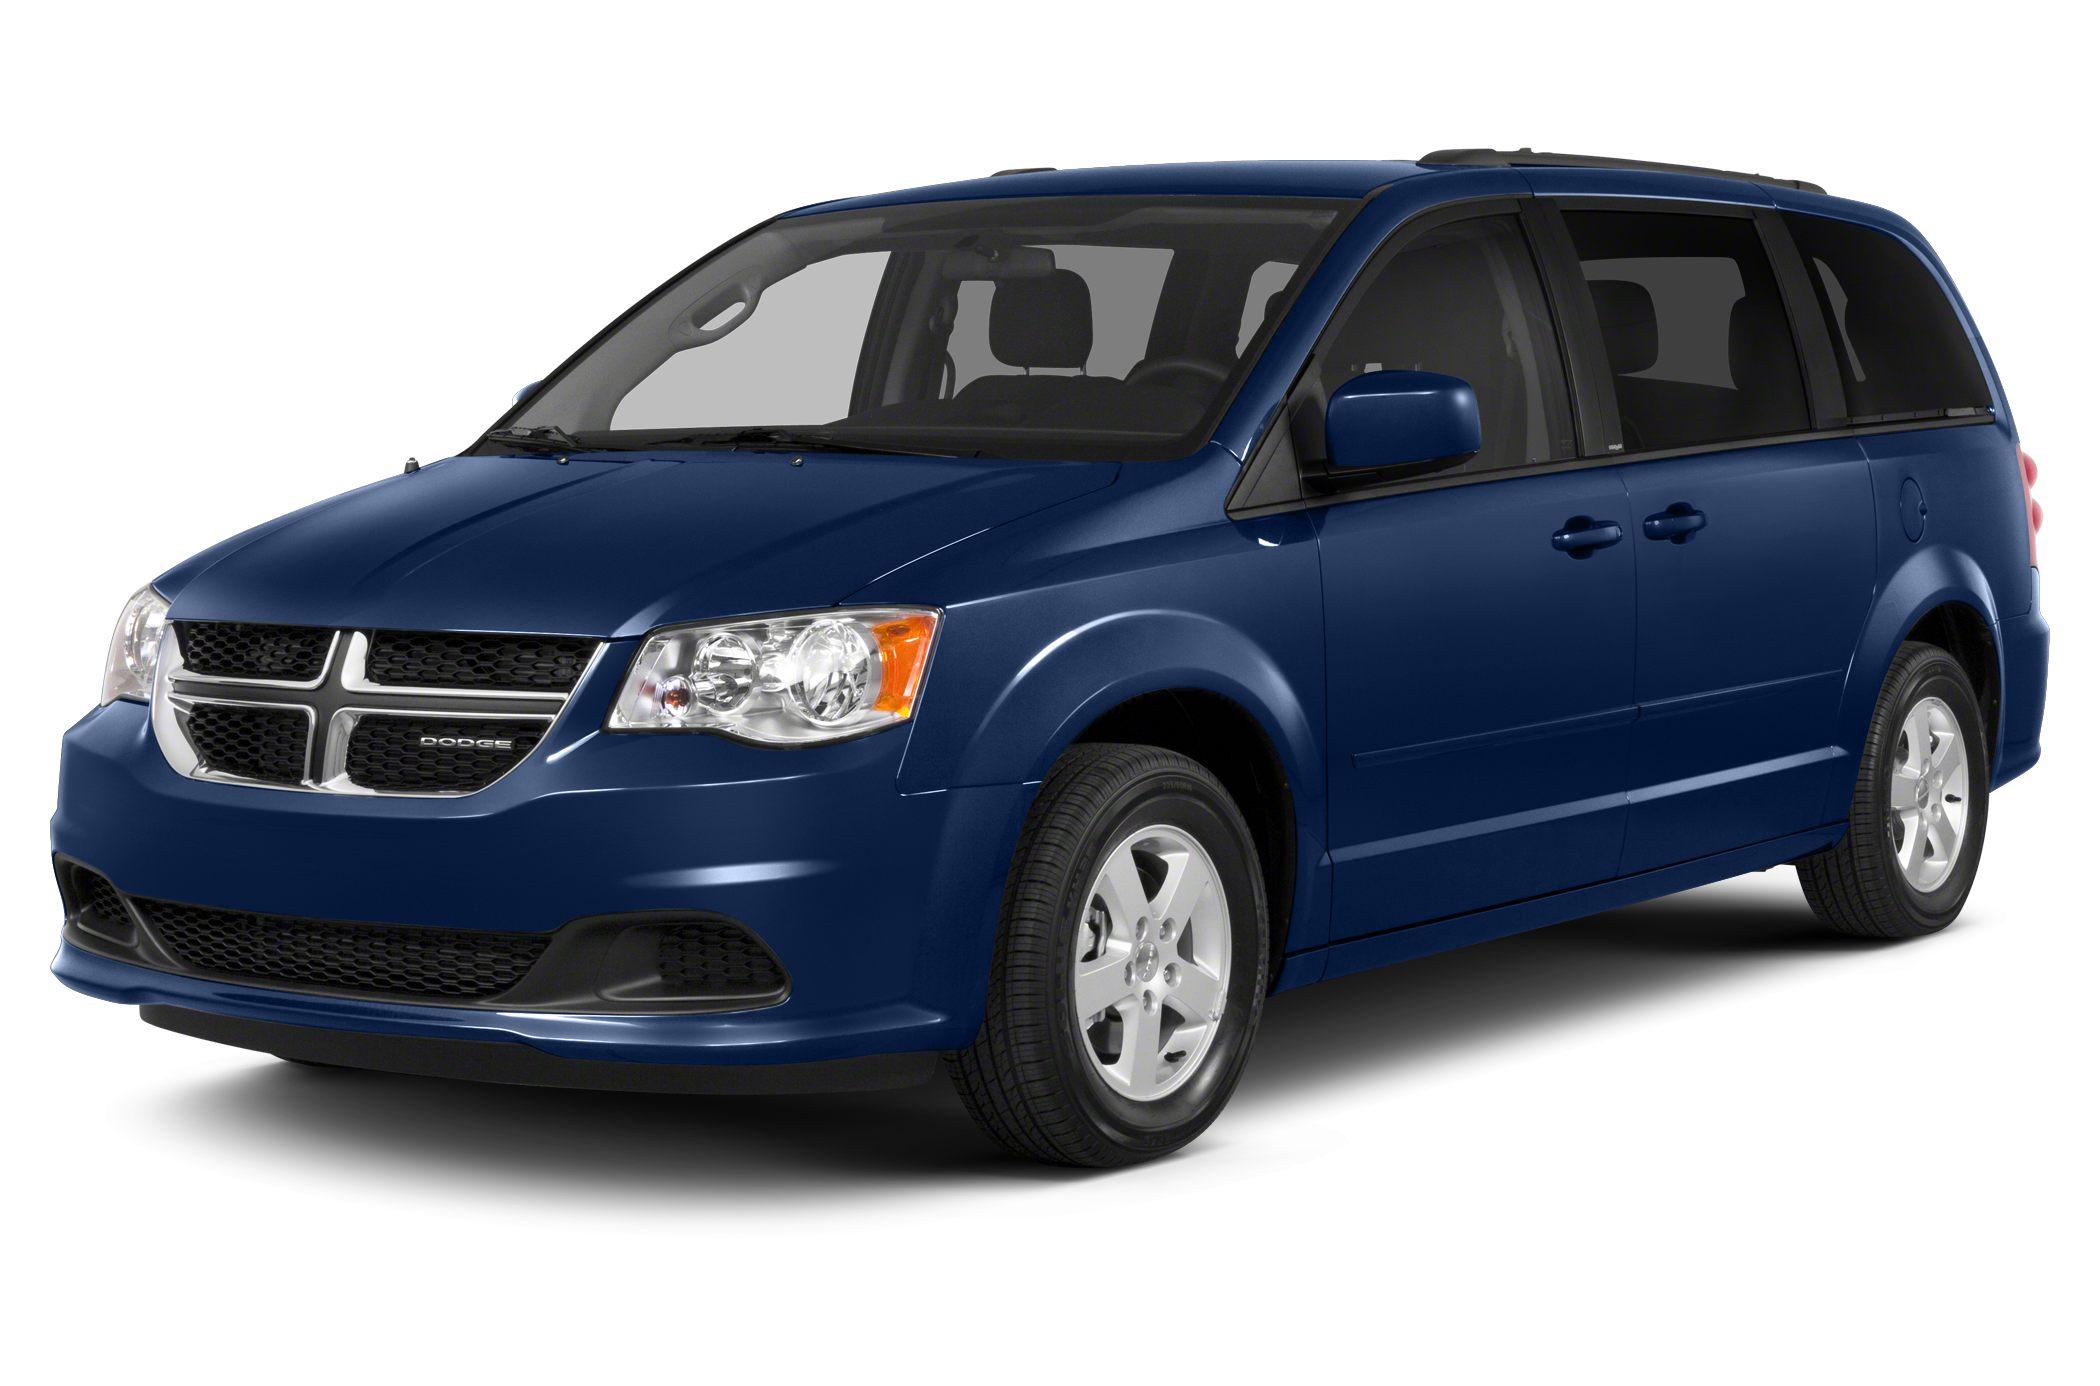 2013 Dodge Grand Caravan